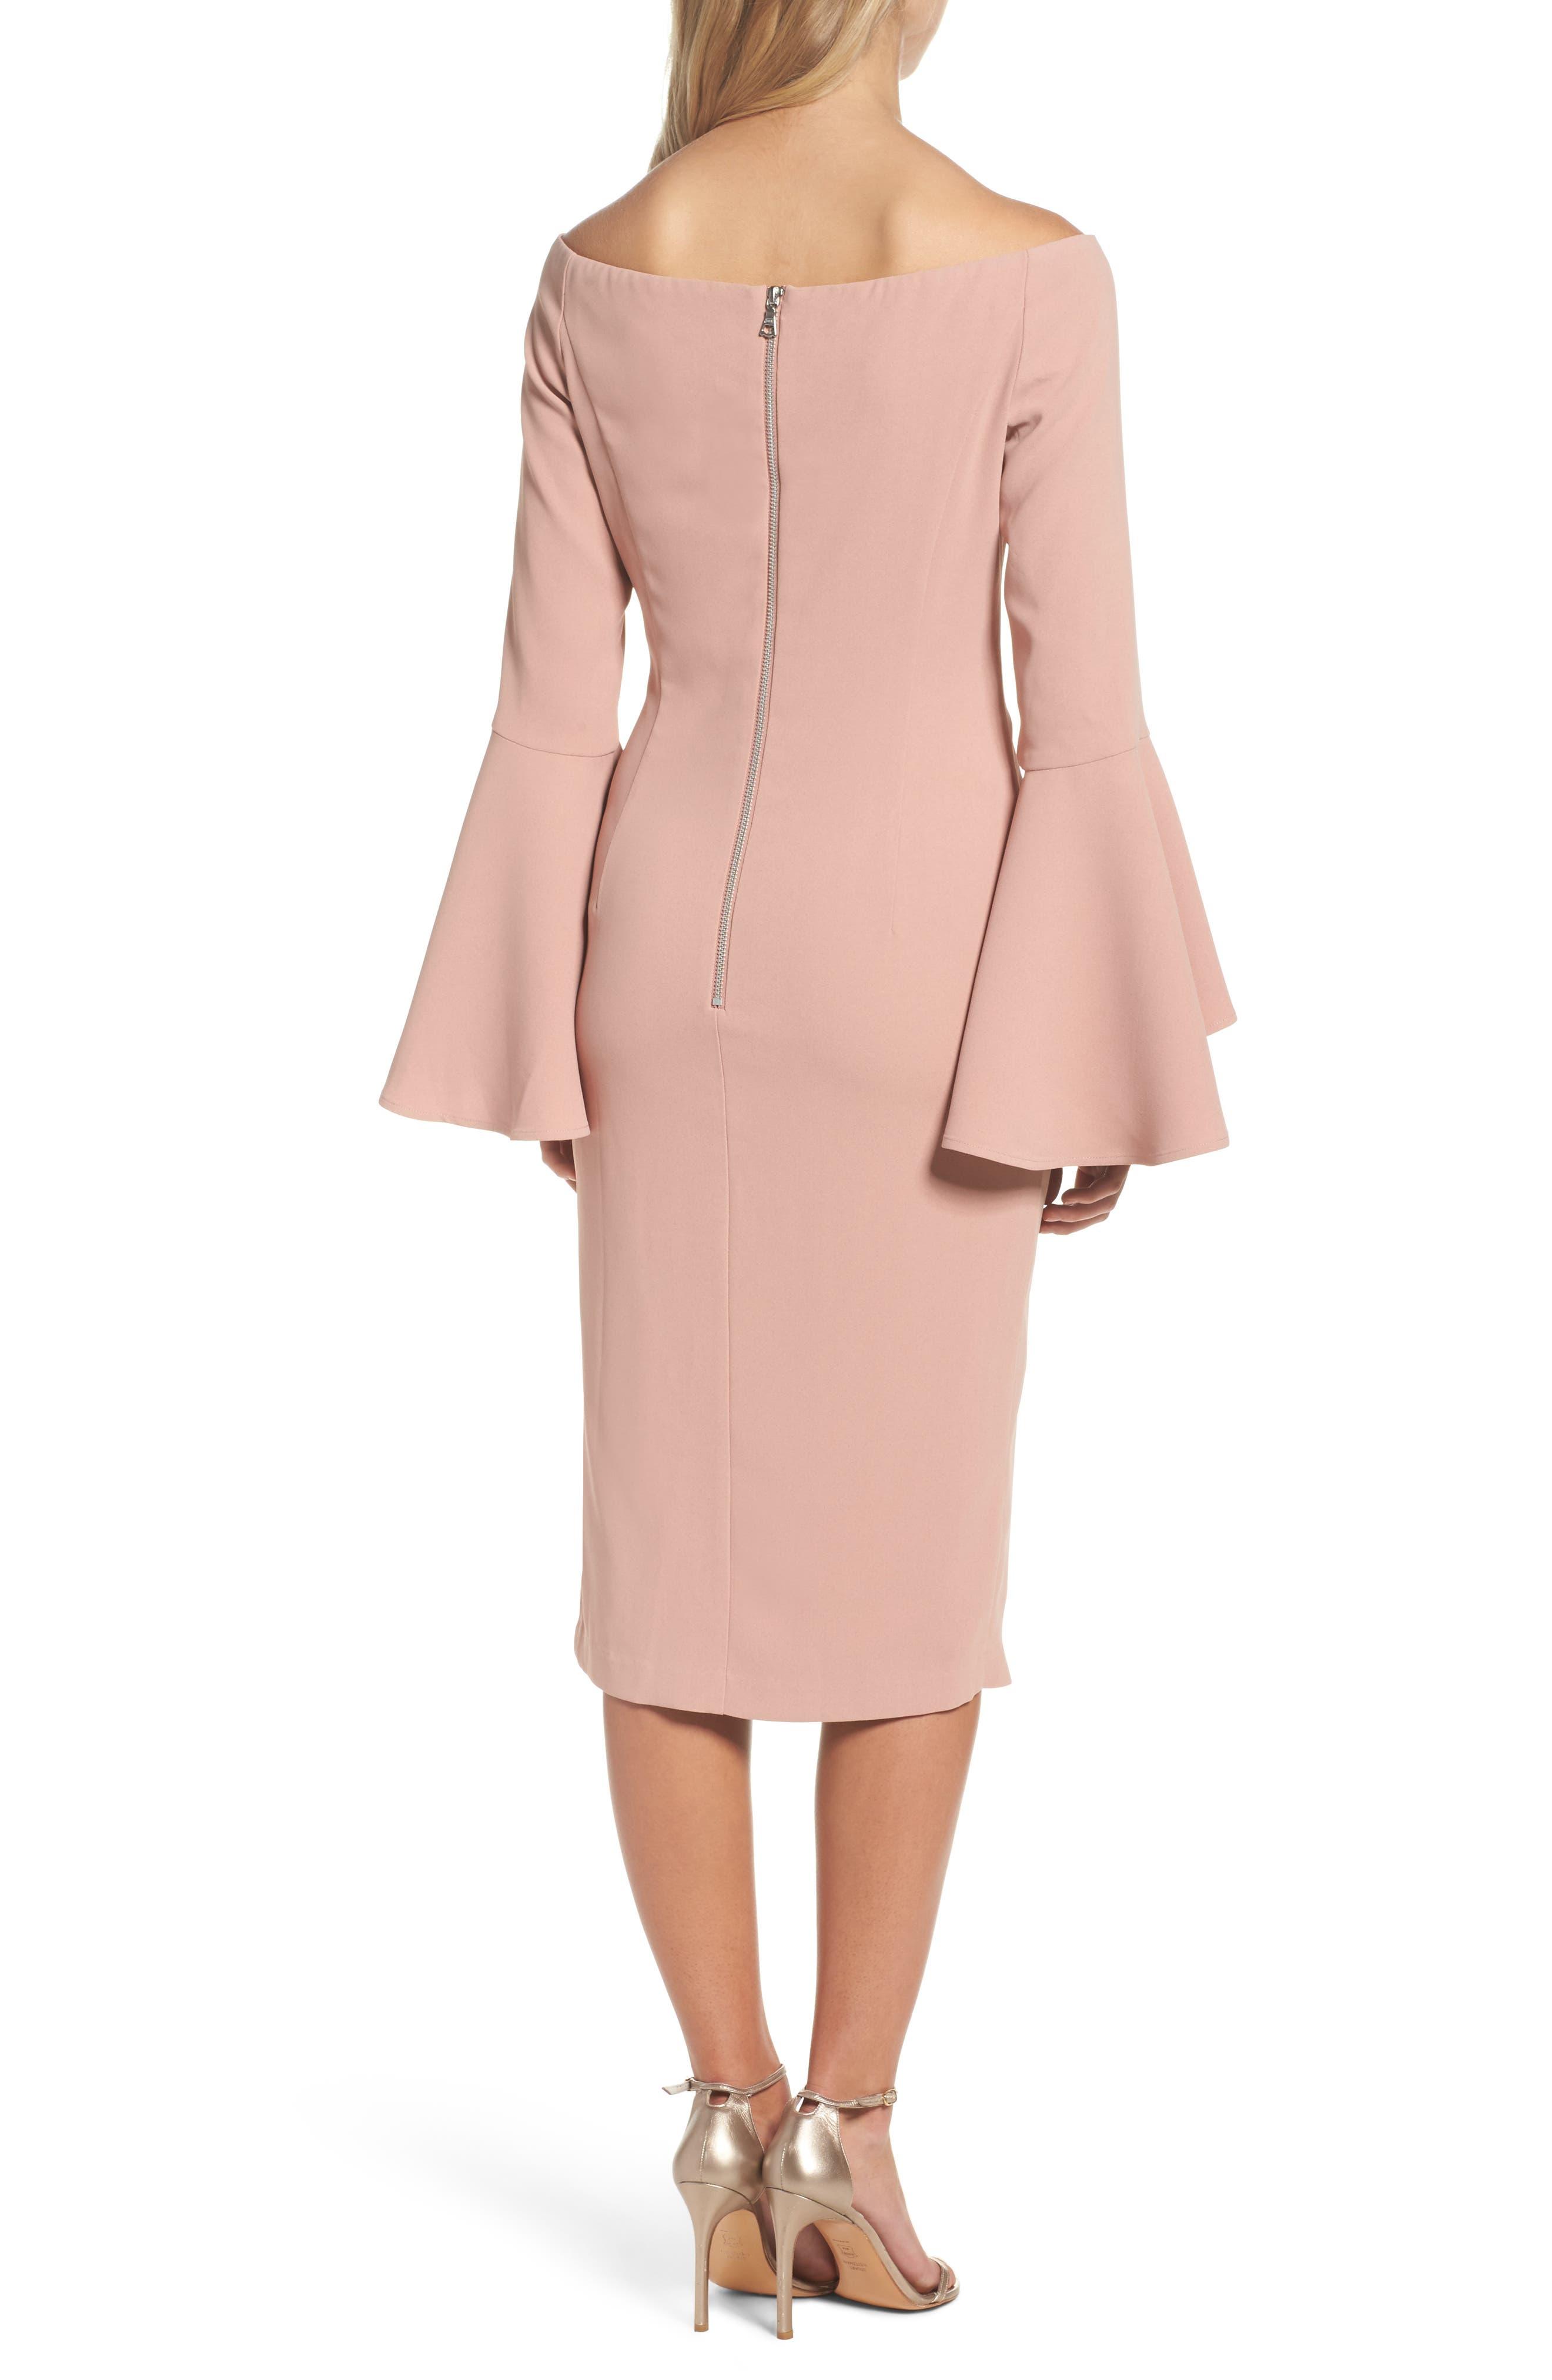 'Solange' Off the Shoulder Midi Dress,                             Alternate thumbnail 9, color,